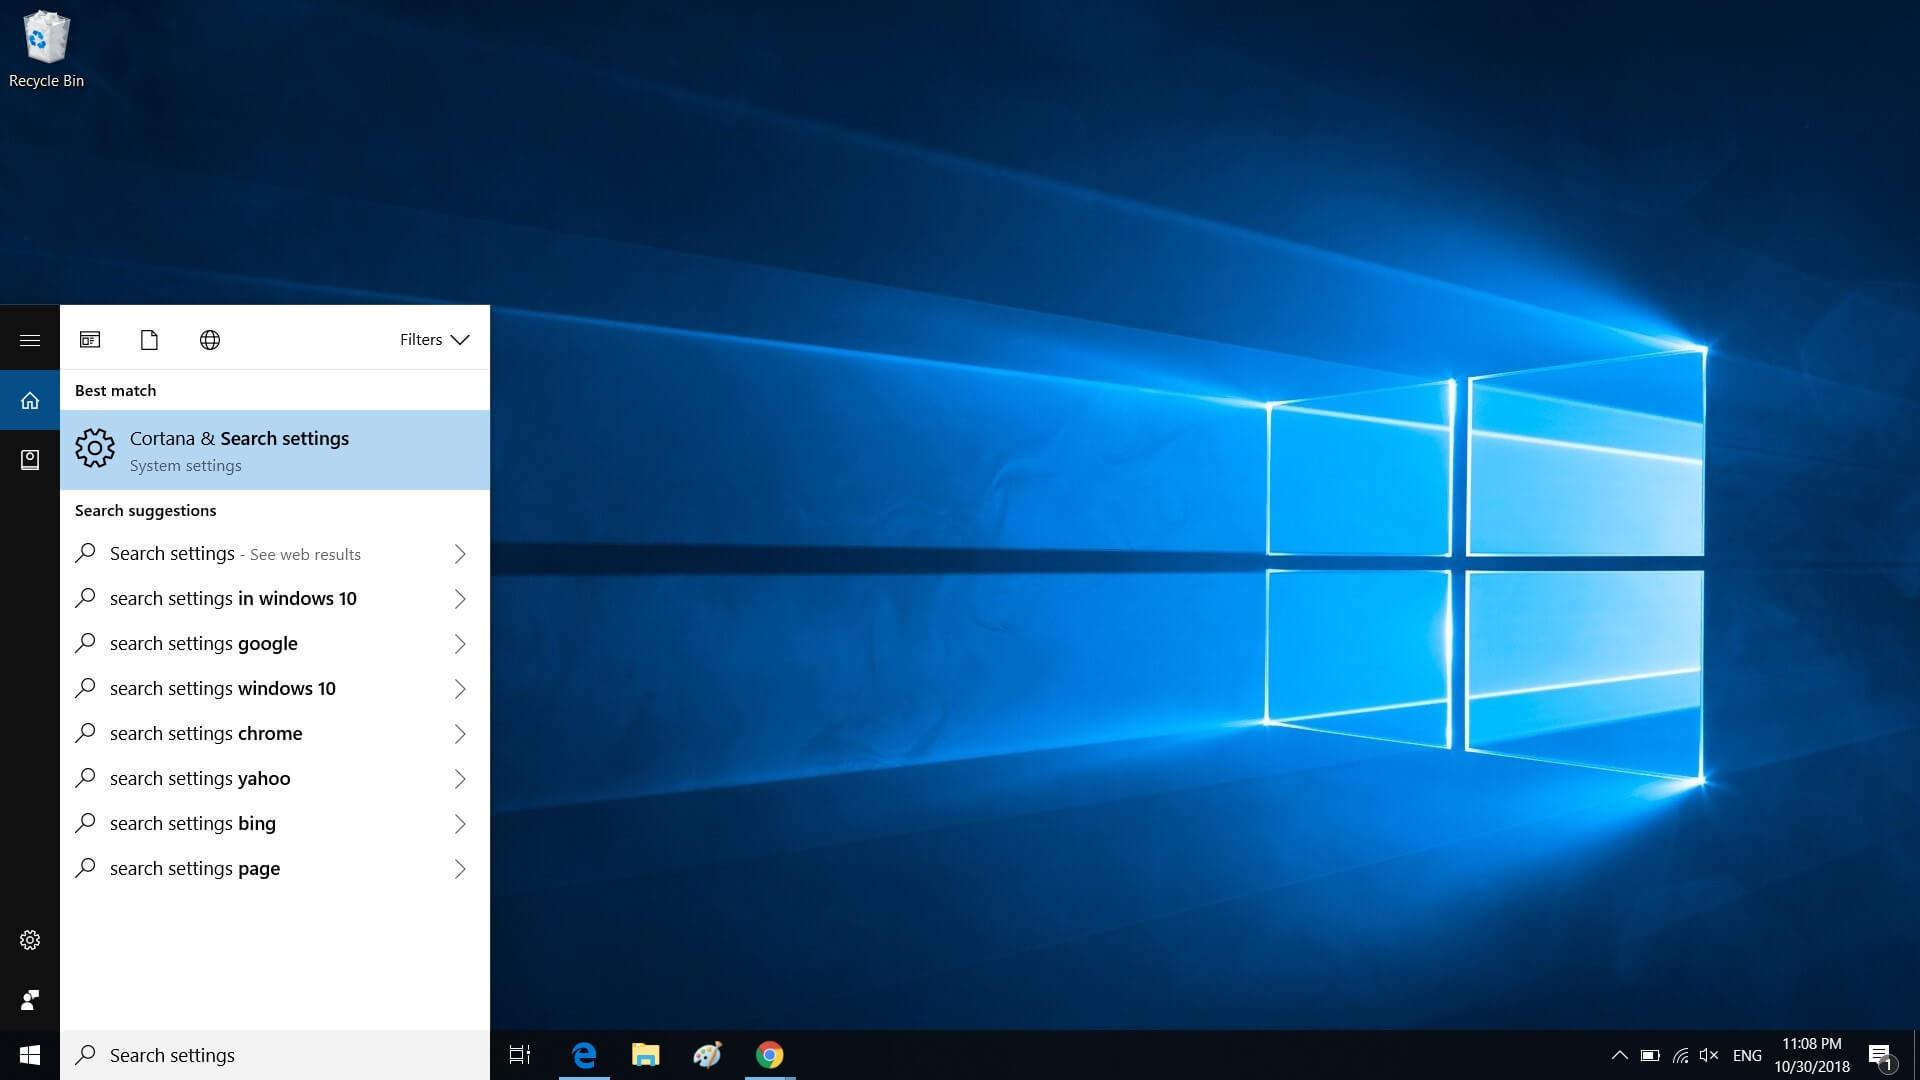 Windows 10 Search Settings